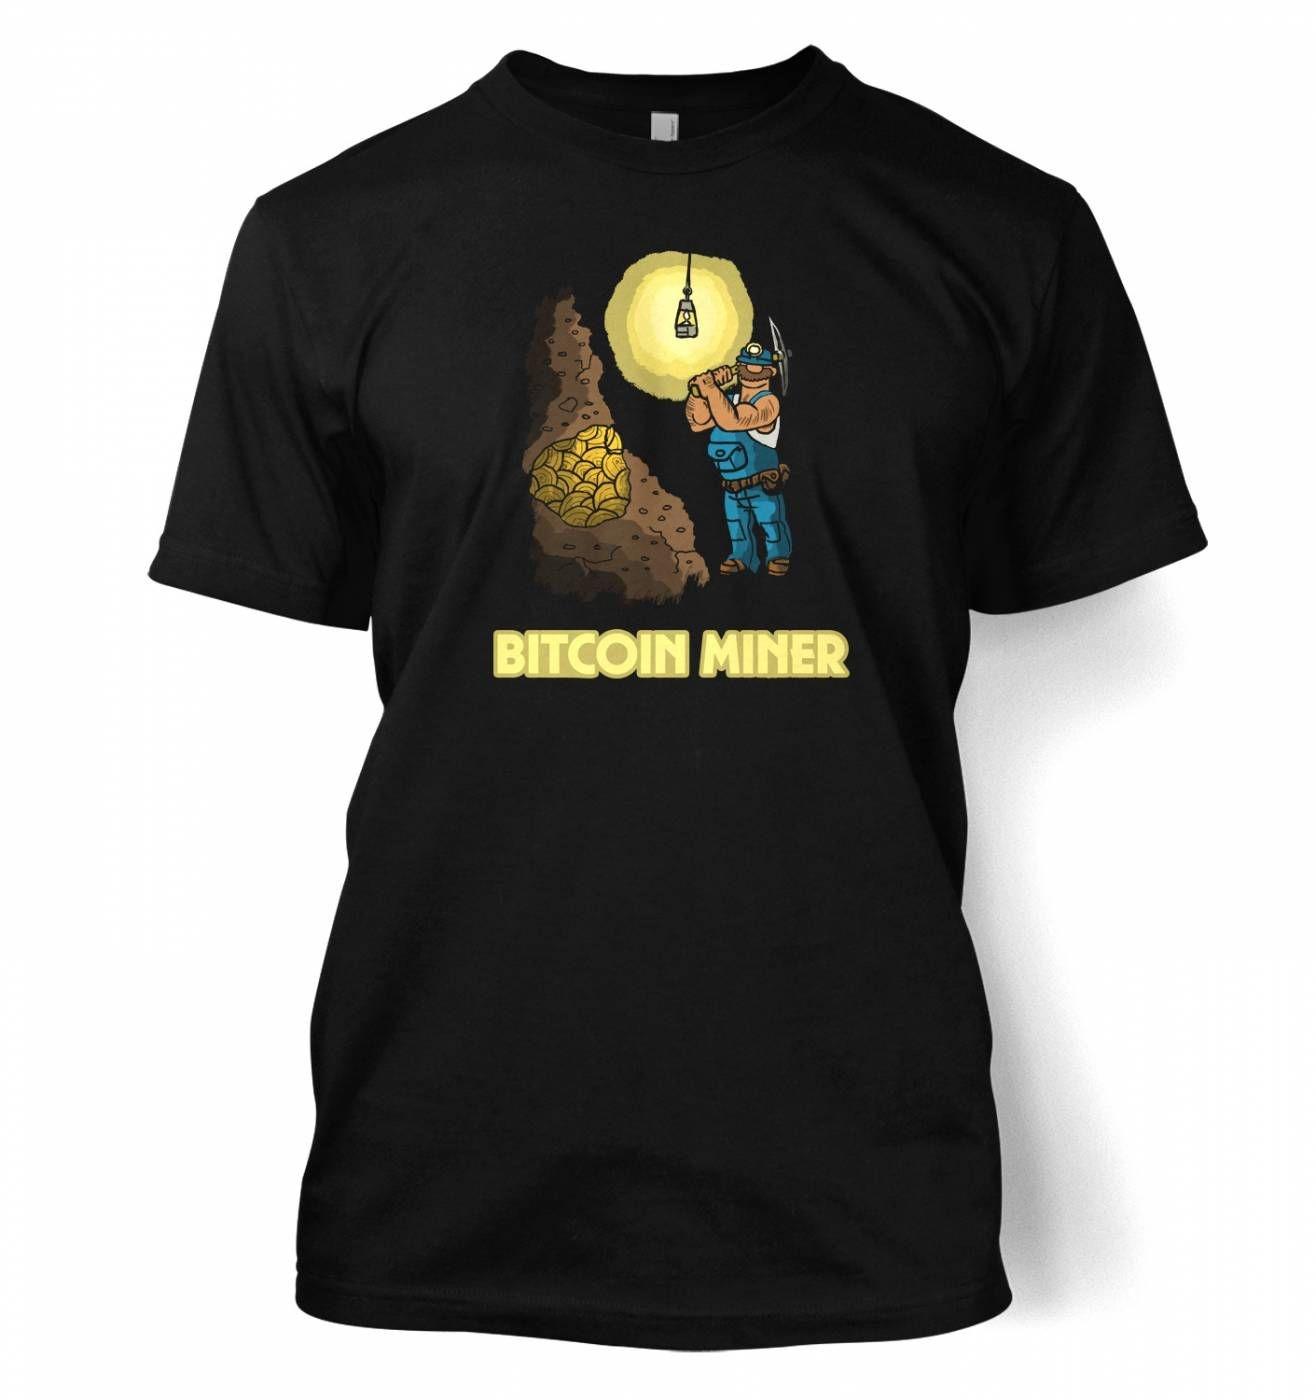 Mining In The Bitcoin Mine t-shirt